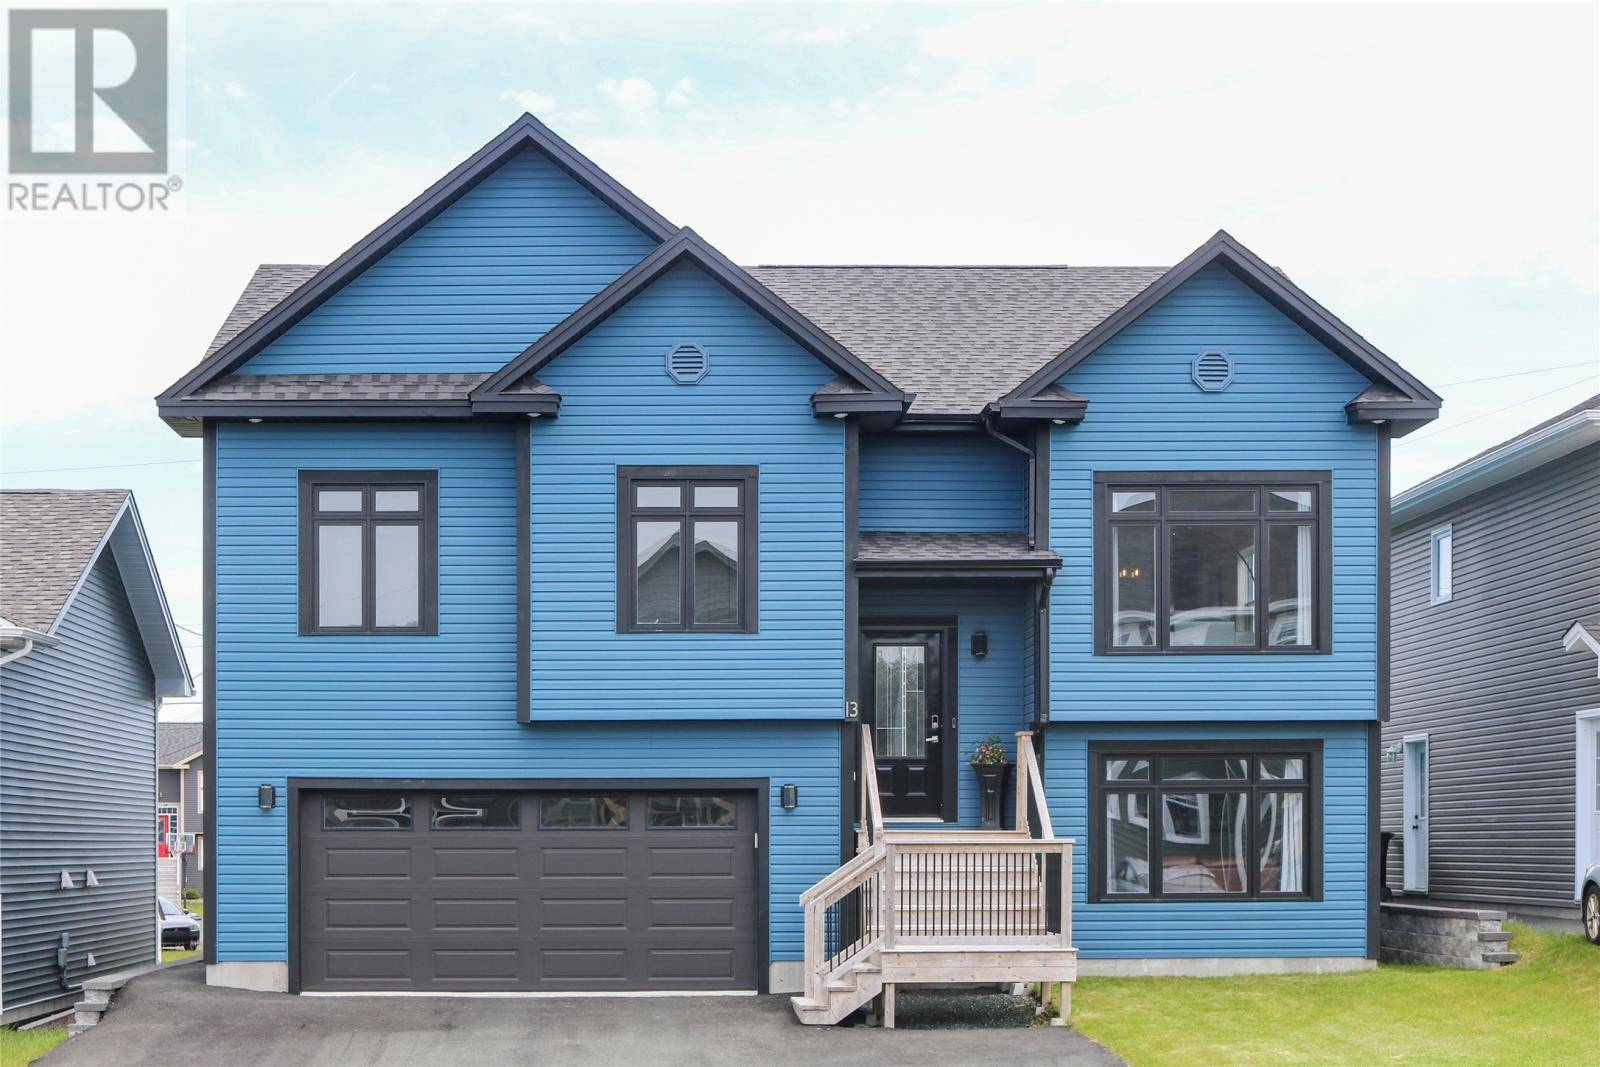 House for sale at 13 Caravelle Pl St. John's Newfoundland - MLS: 1199708